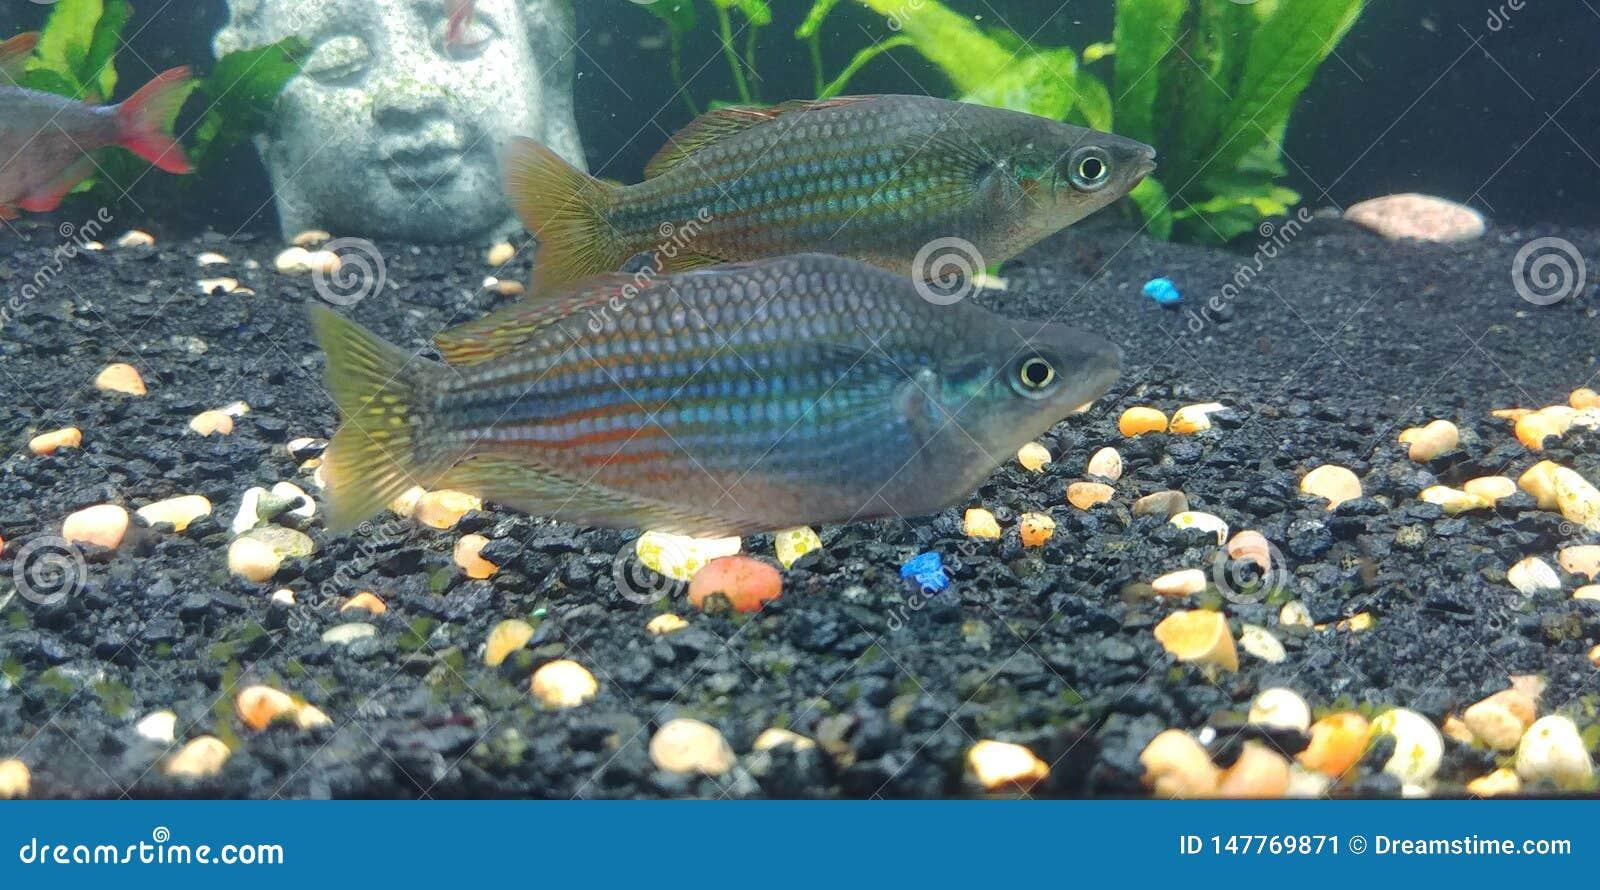 Austrailian Rainbowfish